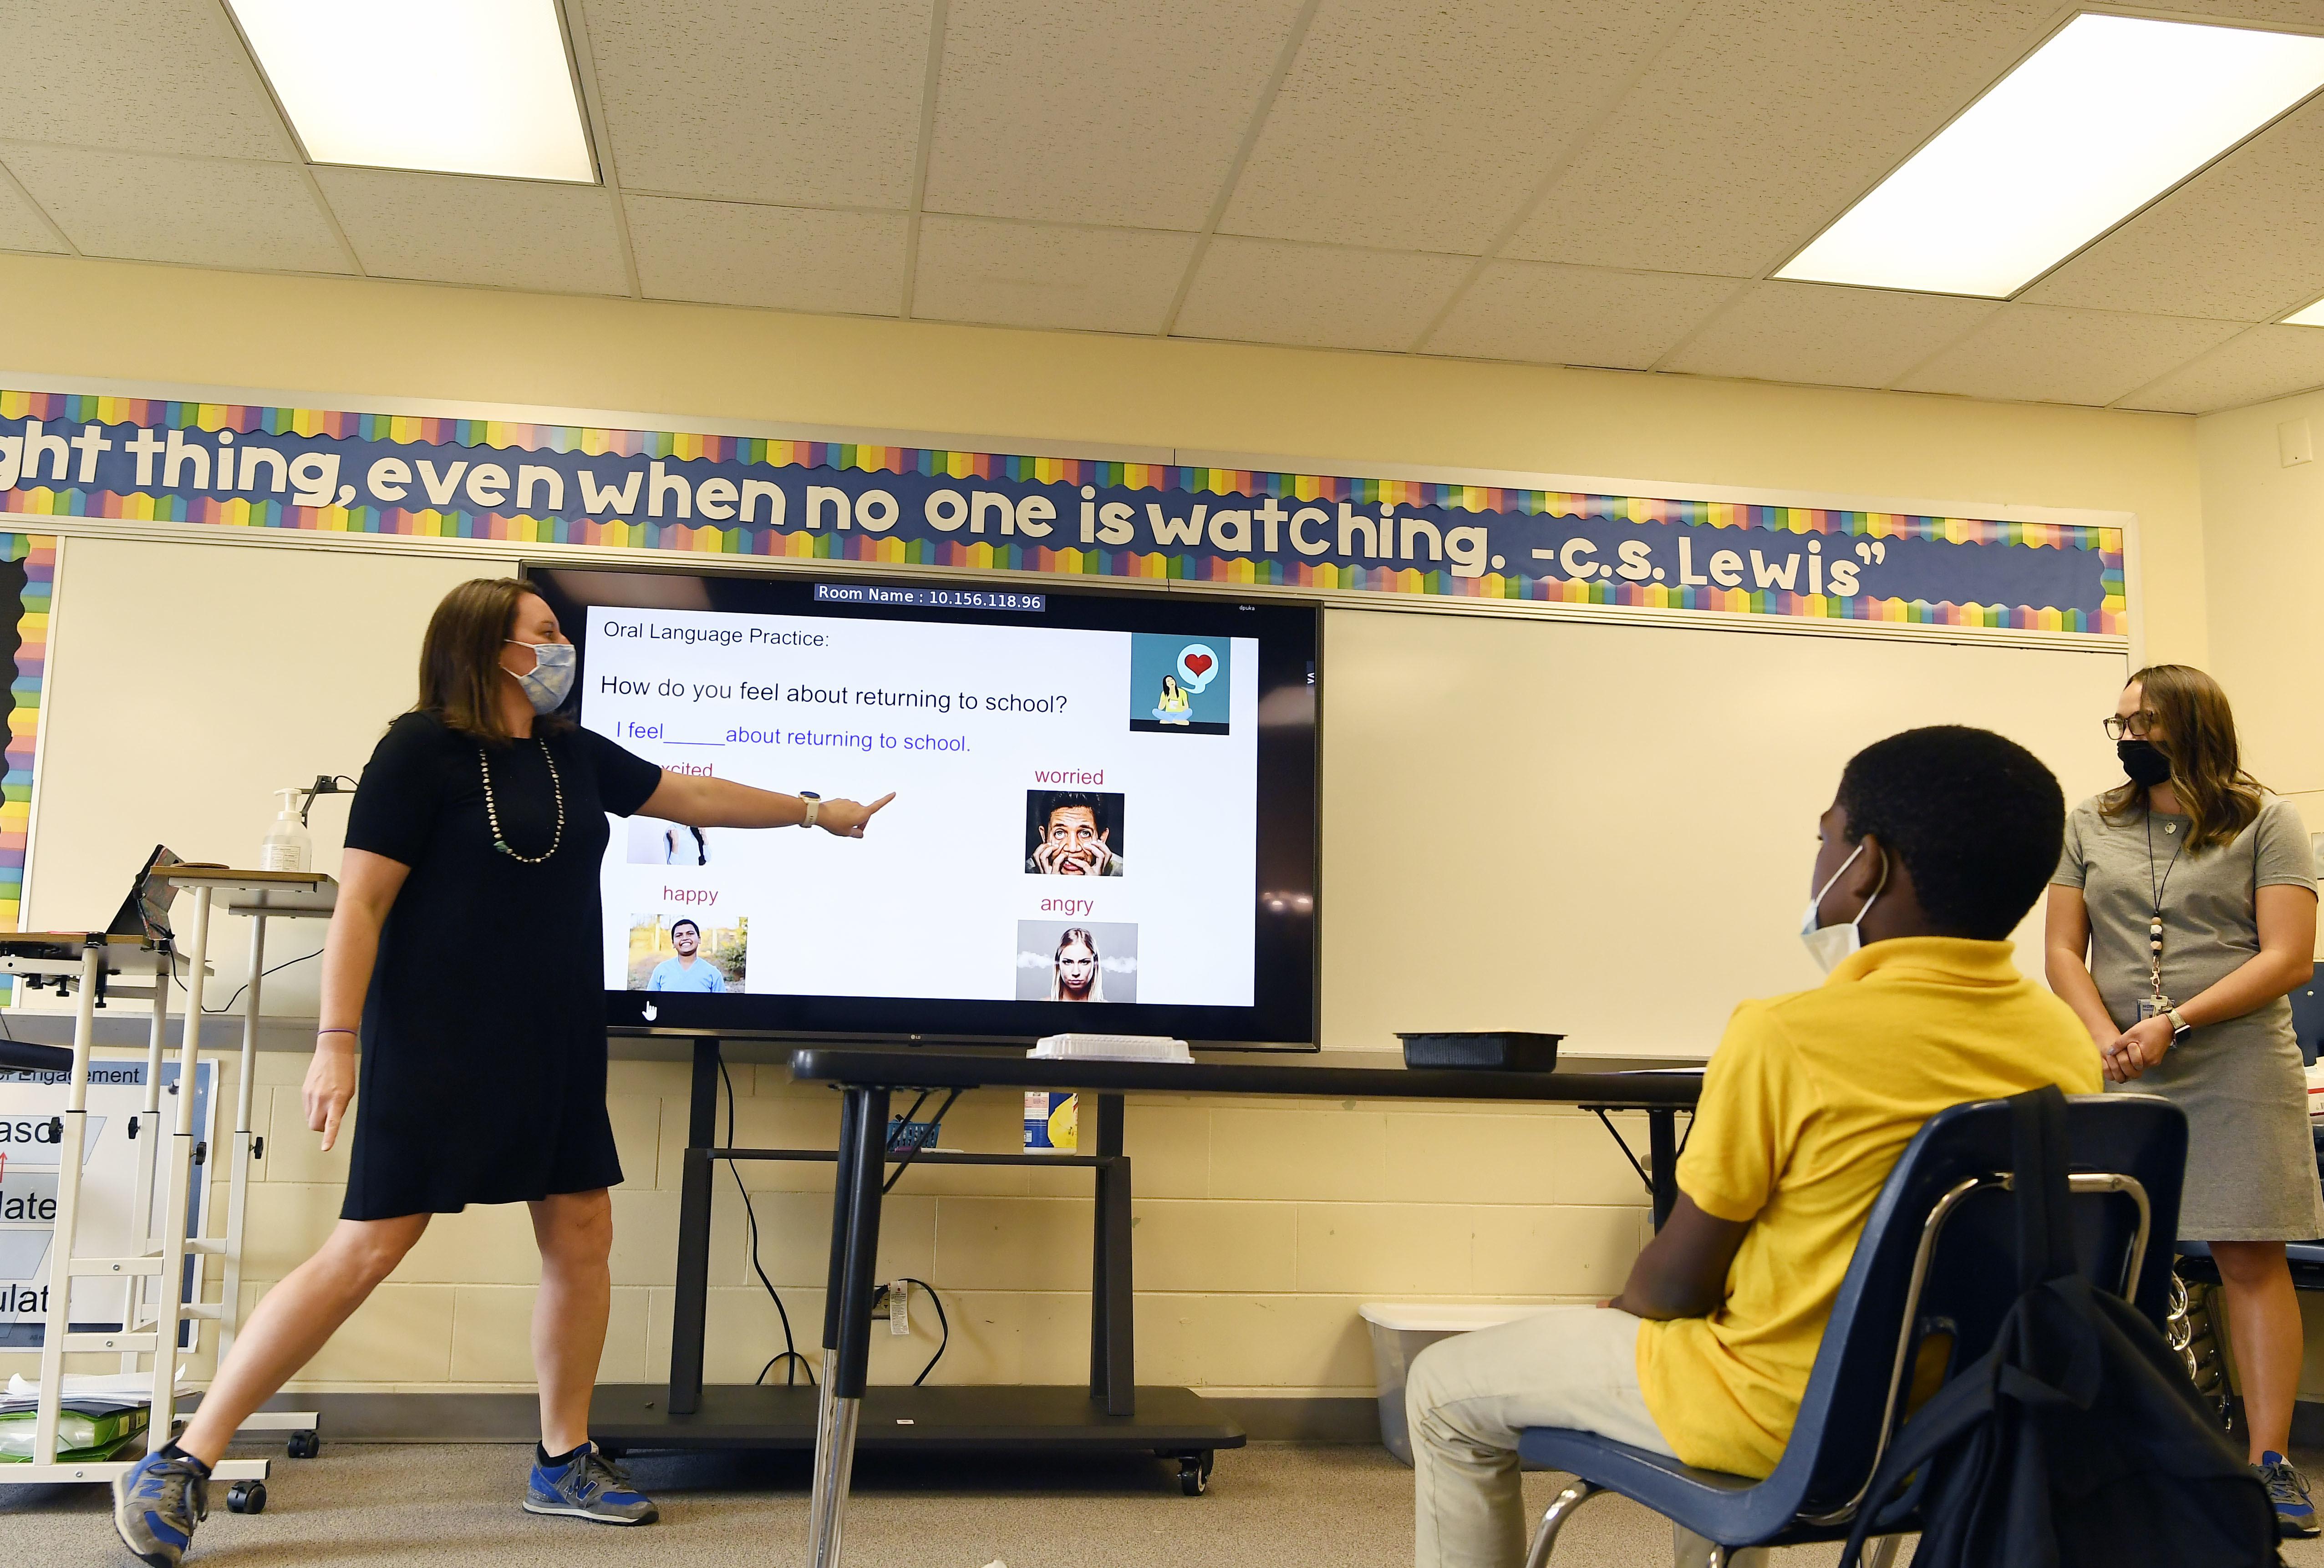 An Aurora teacher wearing a mask points at a screen as students watch.